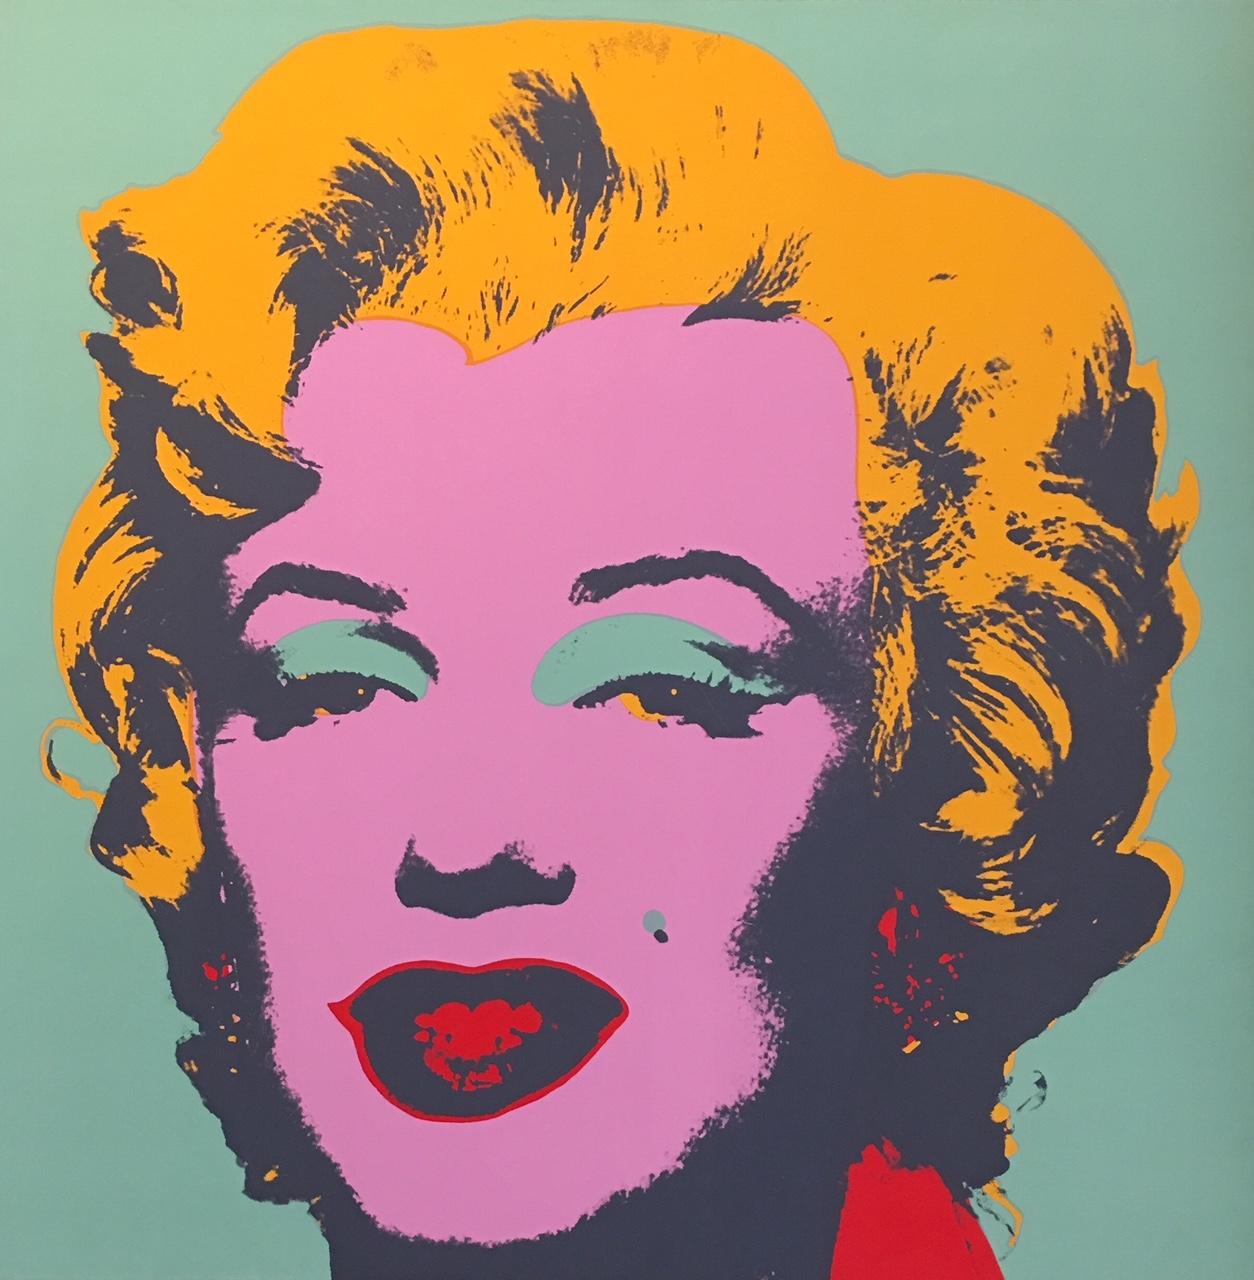 Marilyn Monroe Sunday B Morning Original Vintage Poster